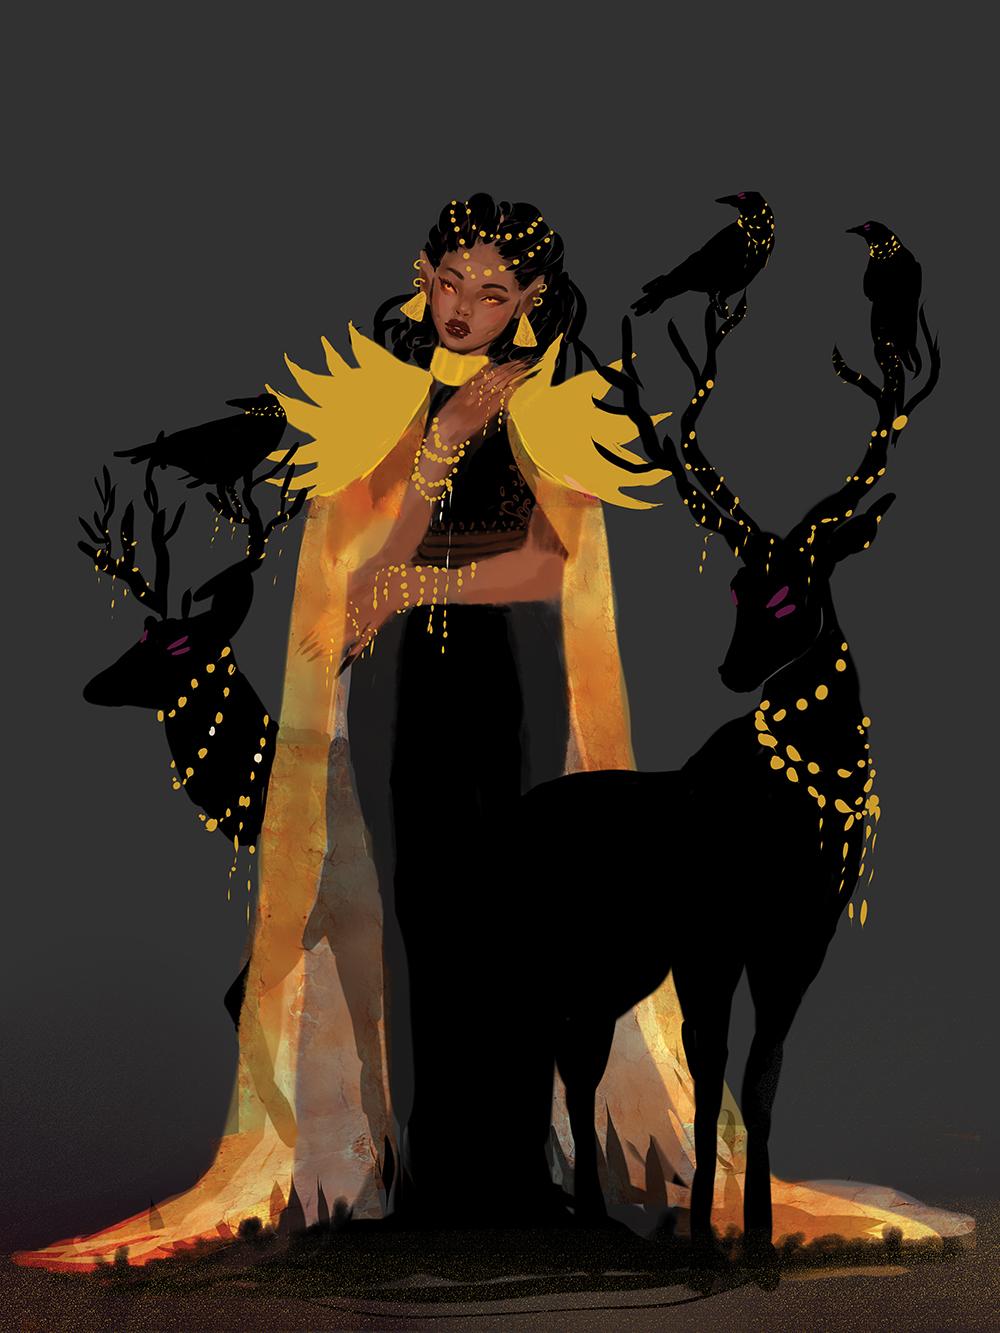 """The Goldenrod Woman"" by Muna Abdirahman"